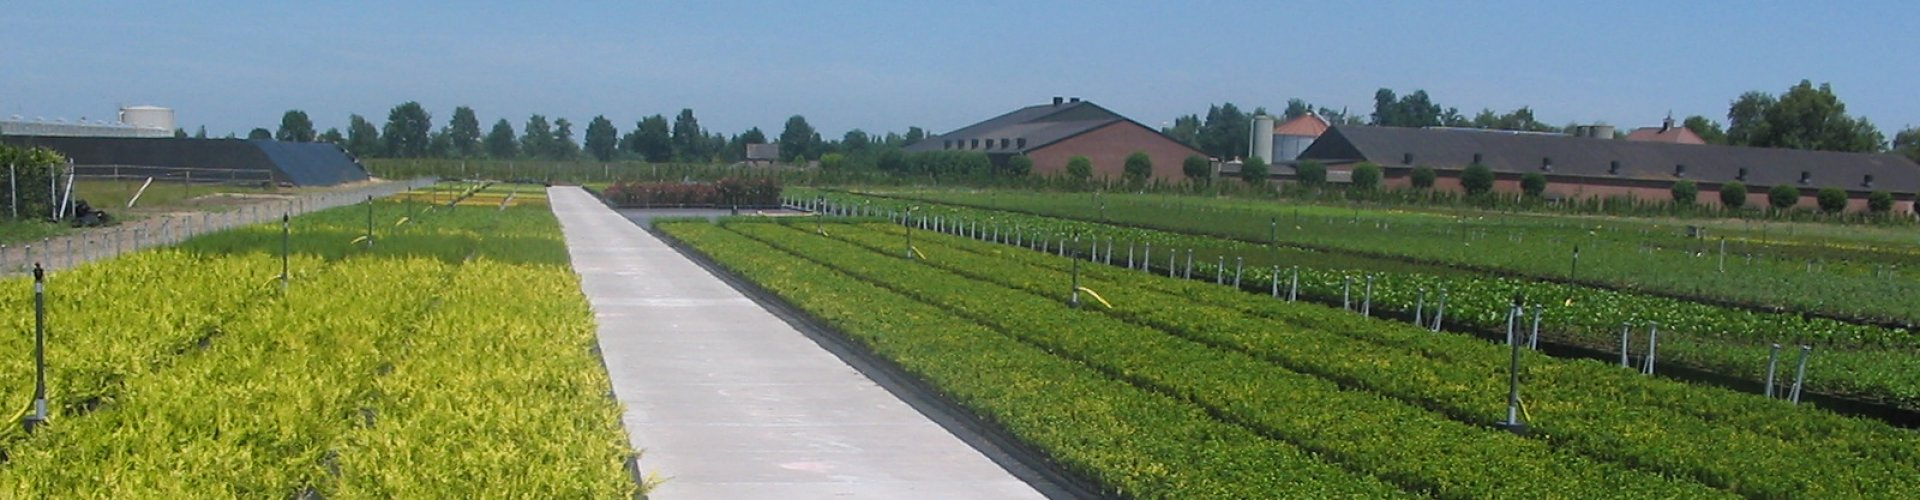 Land-_en_tuinbouw_11920x500